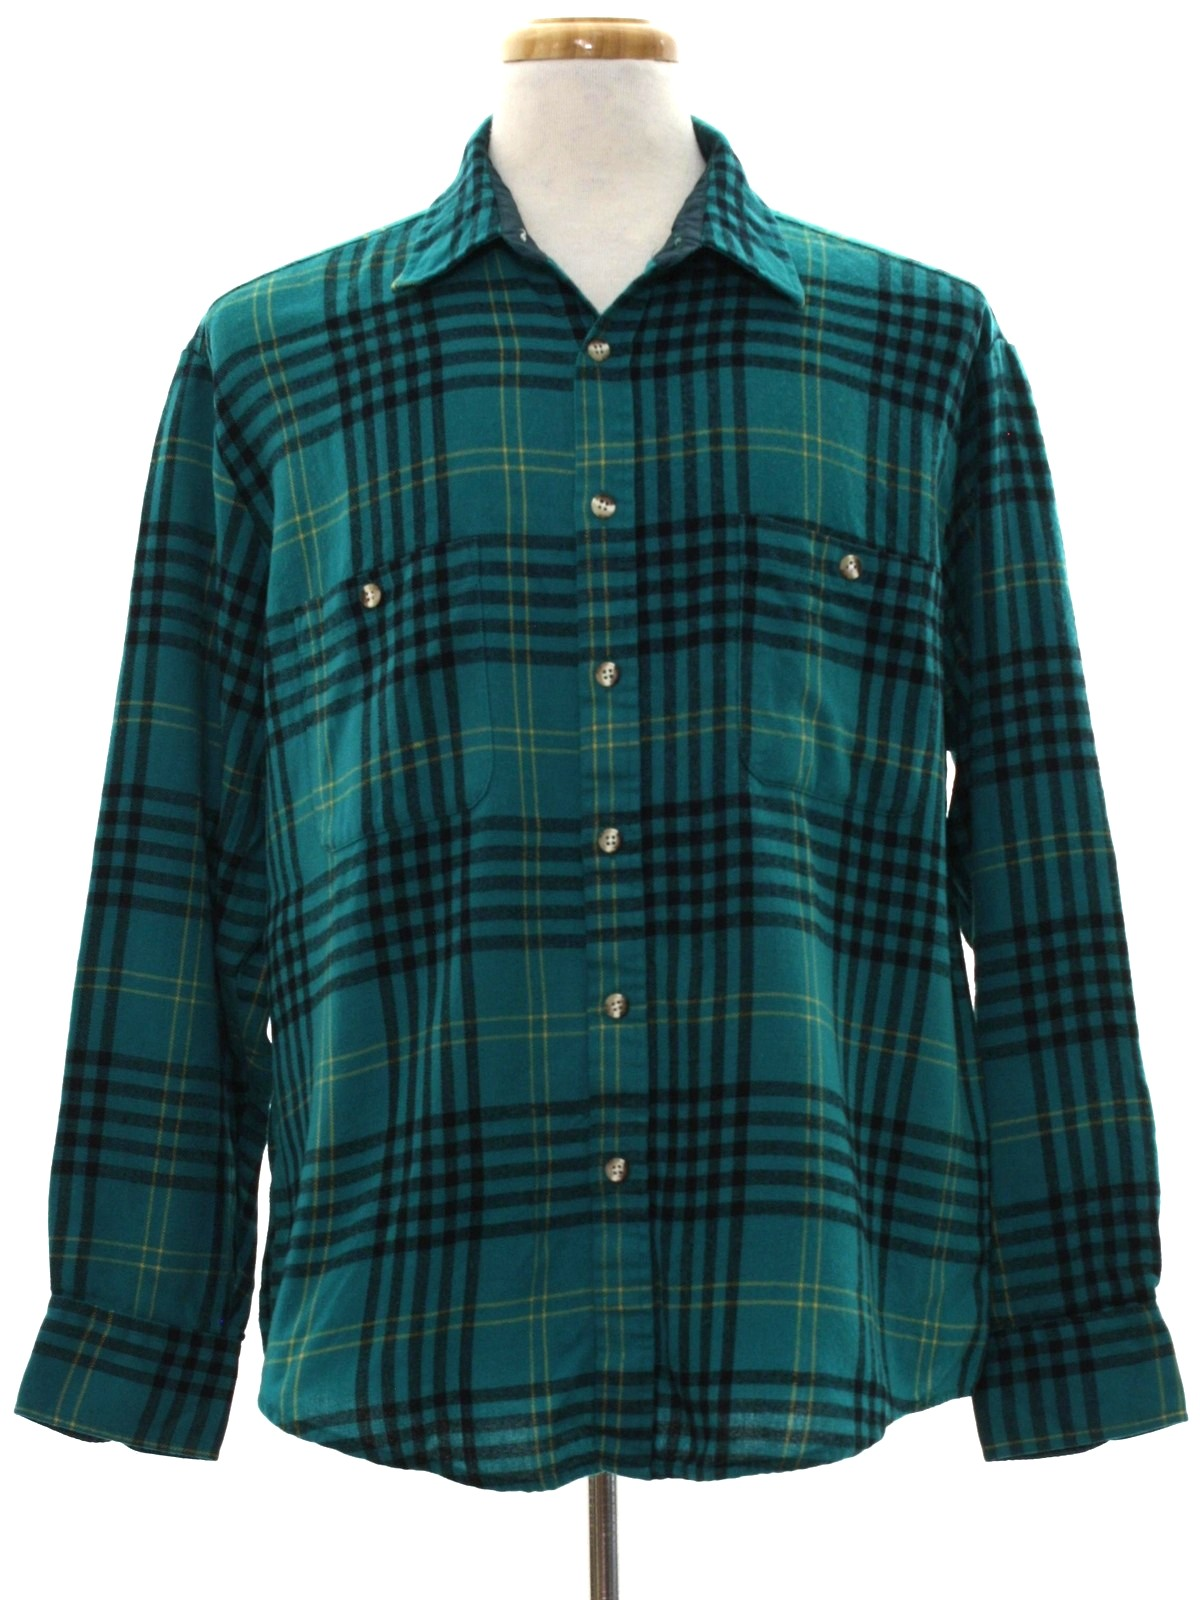 1990 39 S Retro Shirt 90s Windridge Mens Teal Green Black